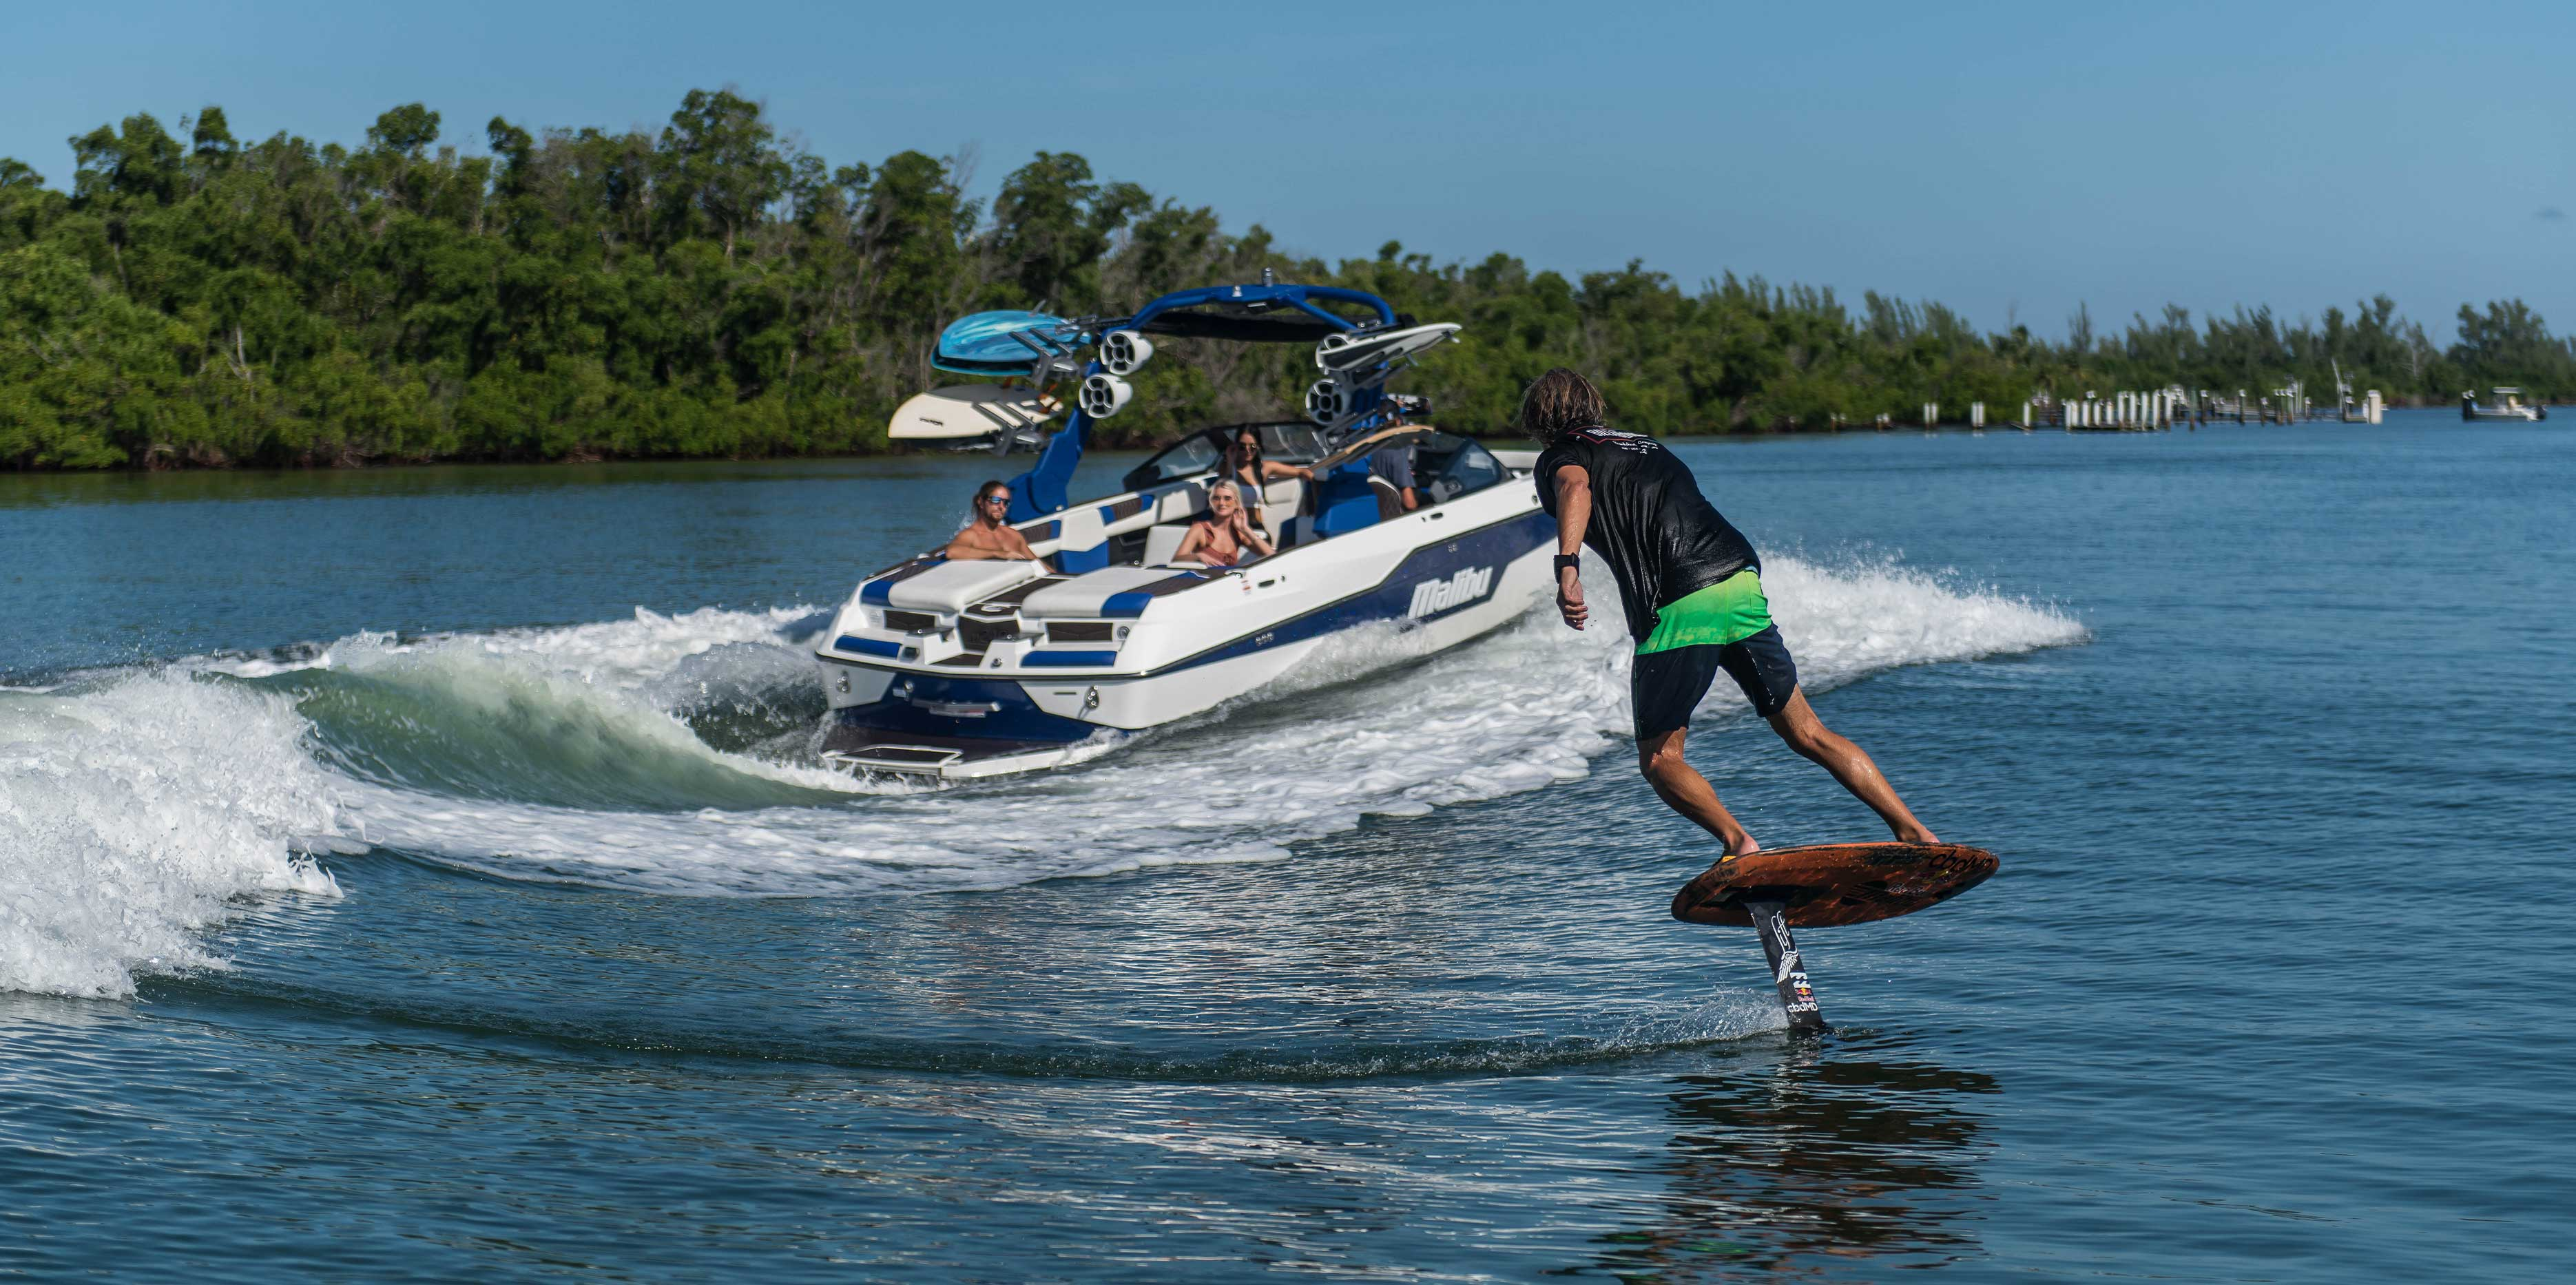 Brian Grubb Wake Foiling Behind a Malibu Boat Wakesetter